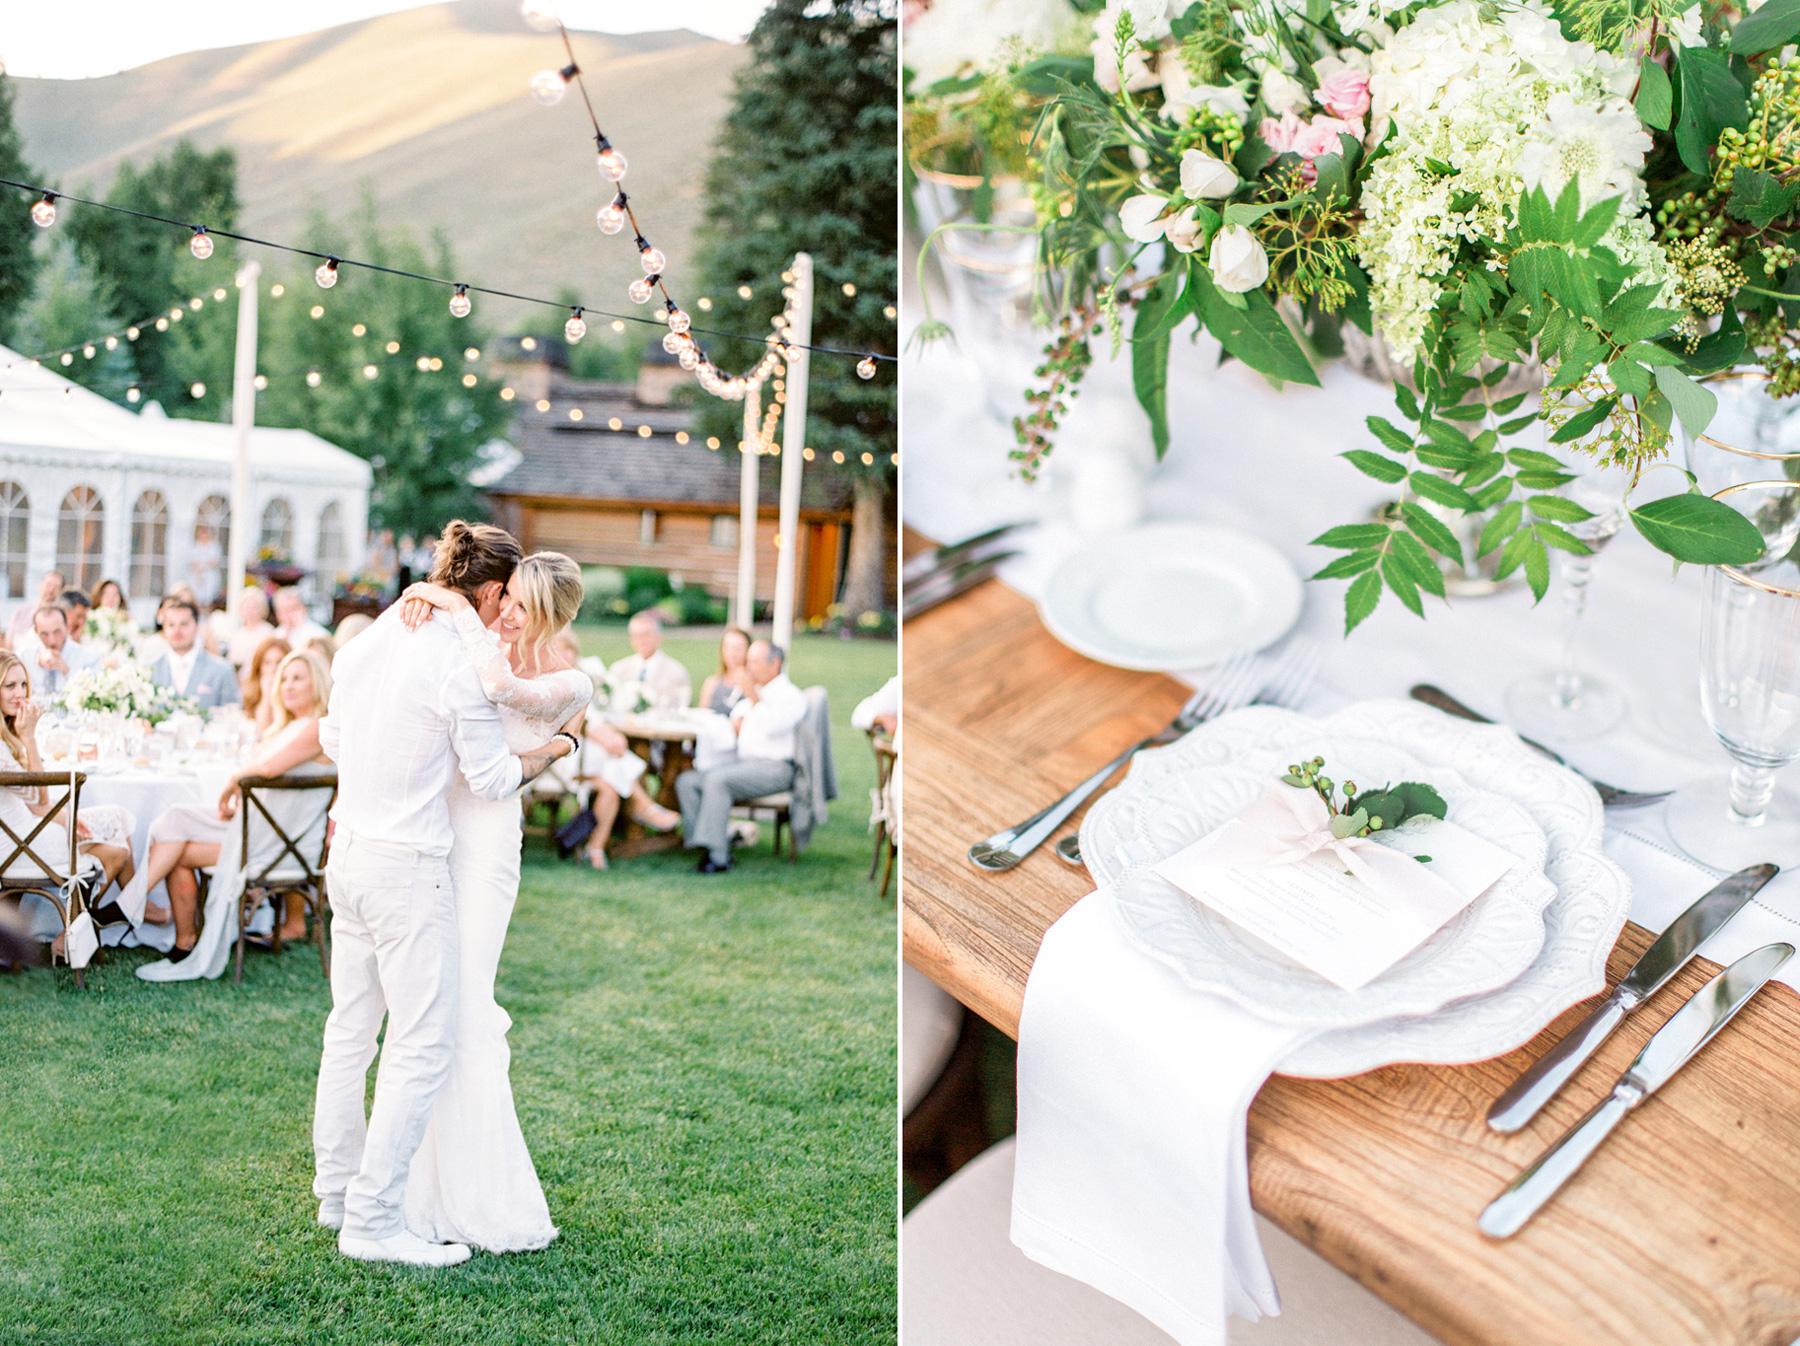 tyler-hubbard-wedding-13.jpg